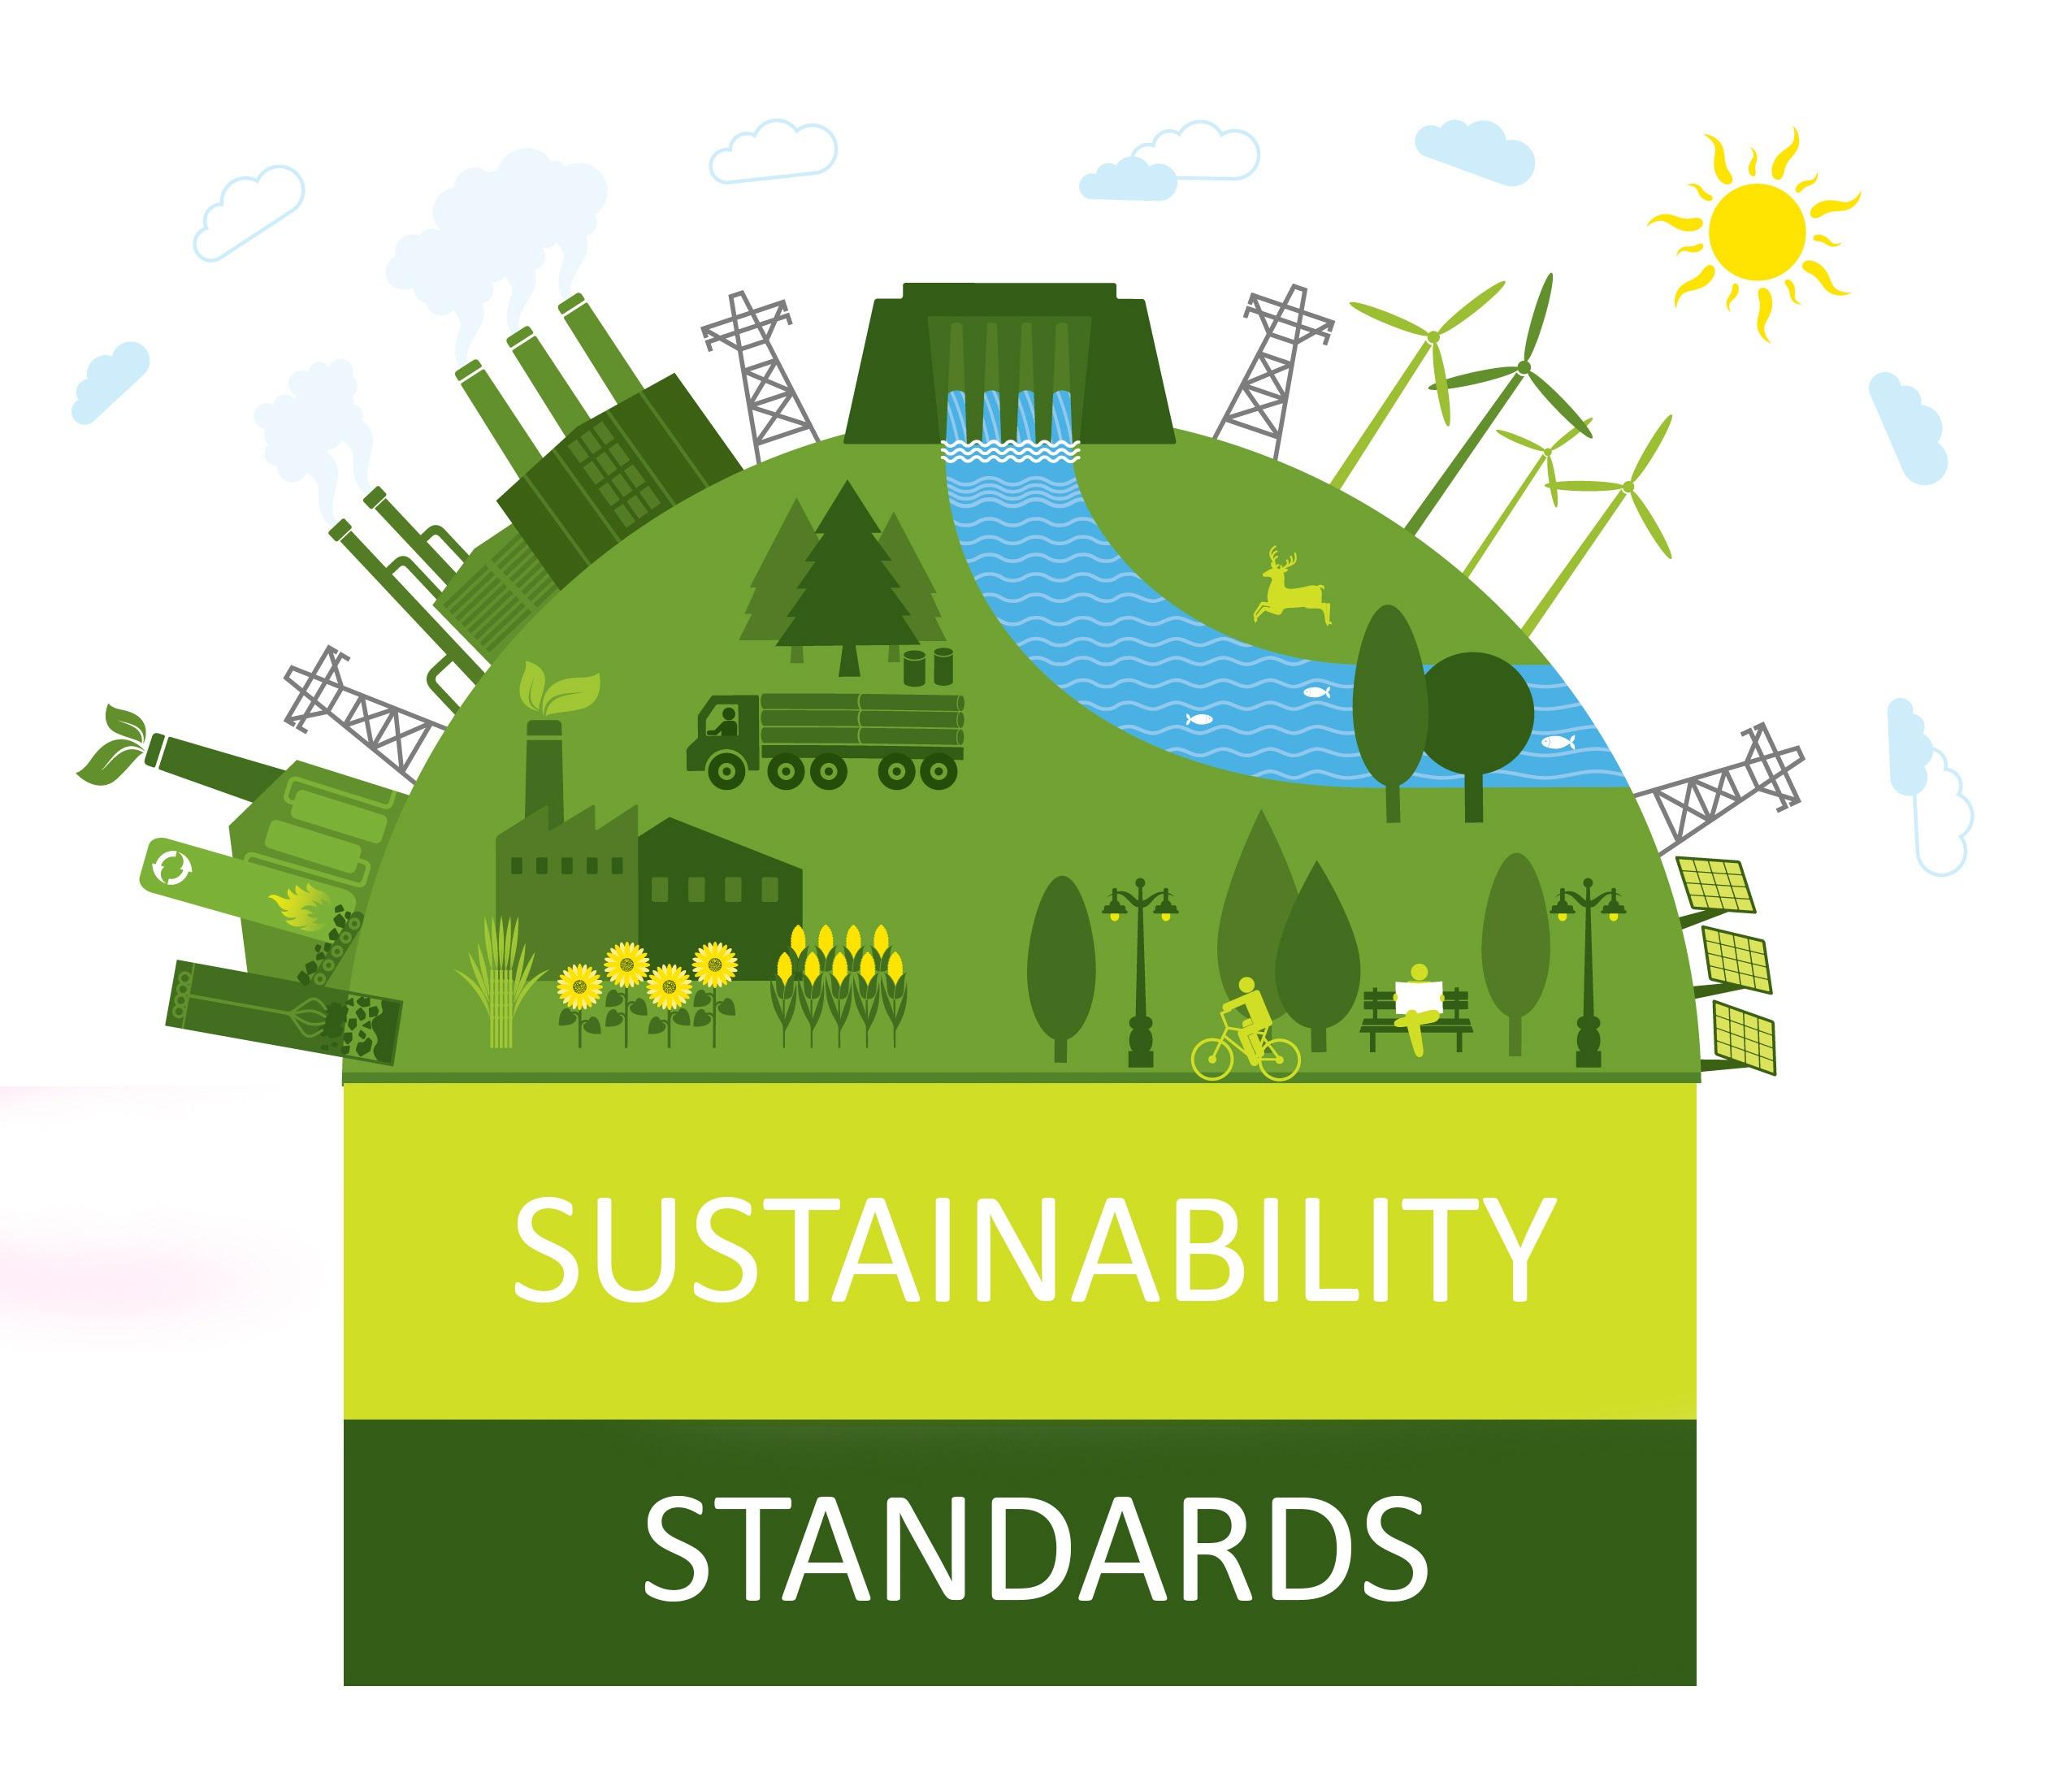 Standards_Companies